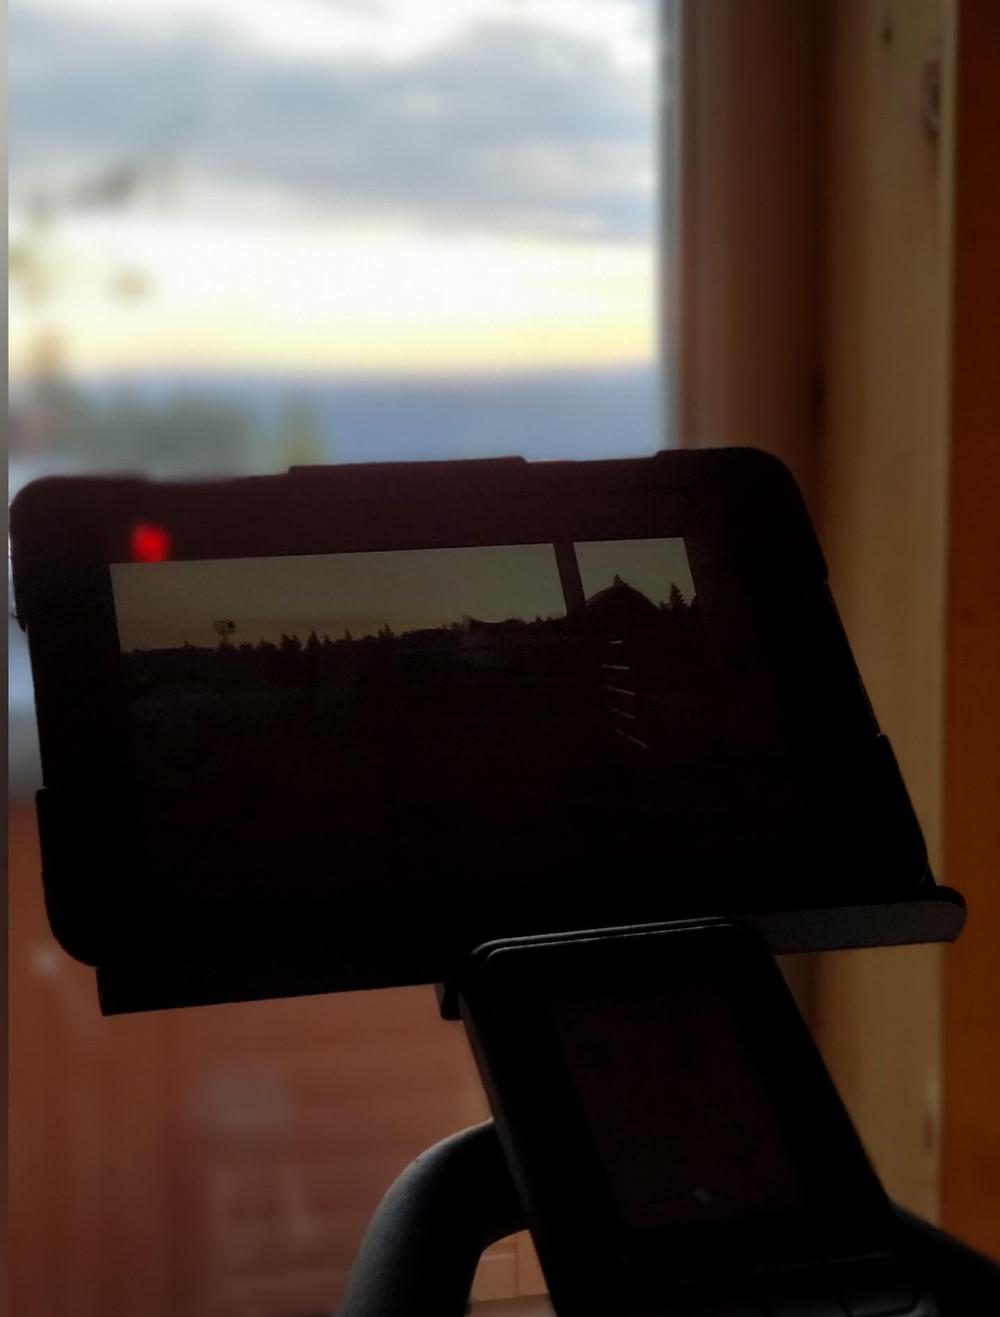 window view spin bike ipad movie